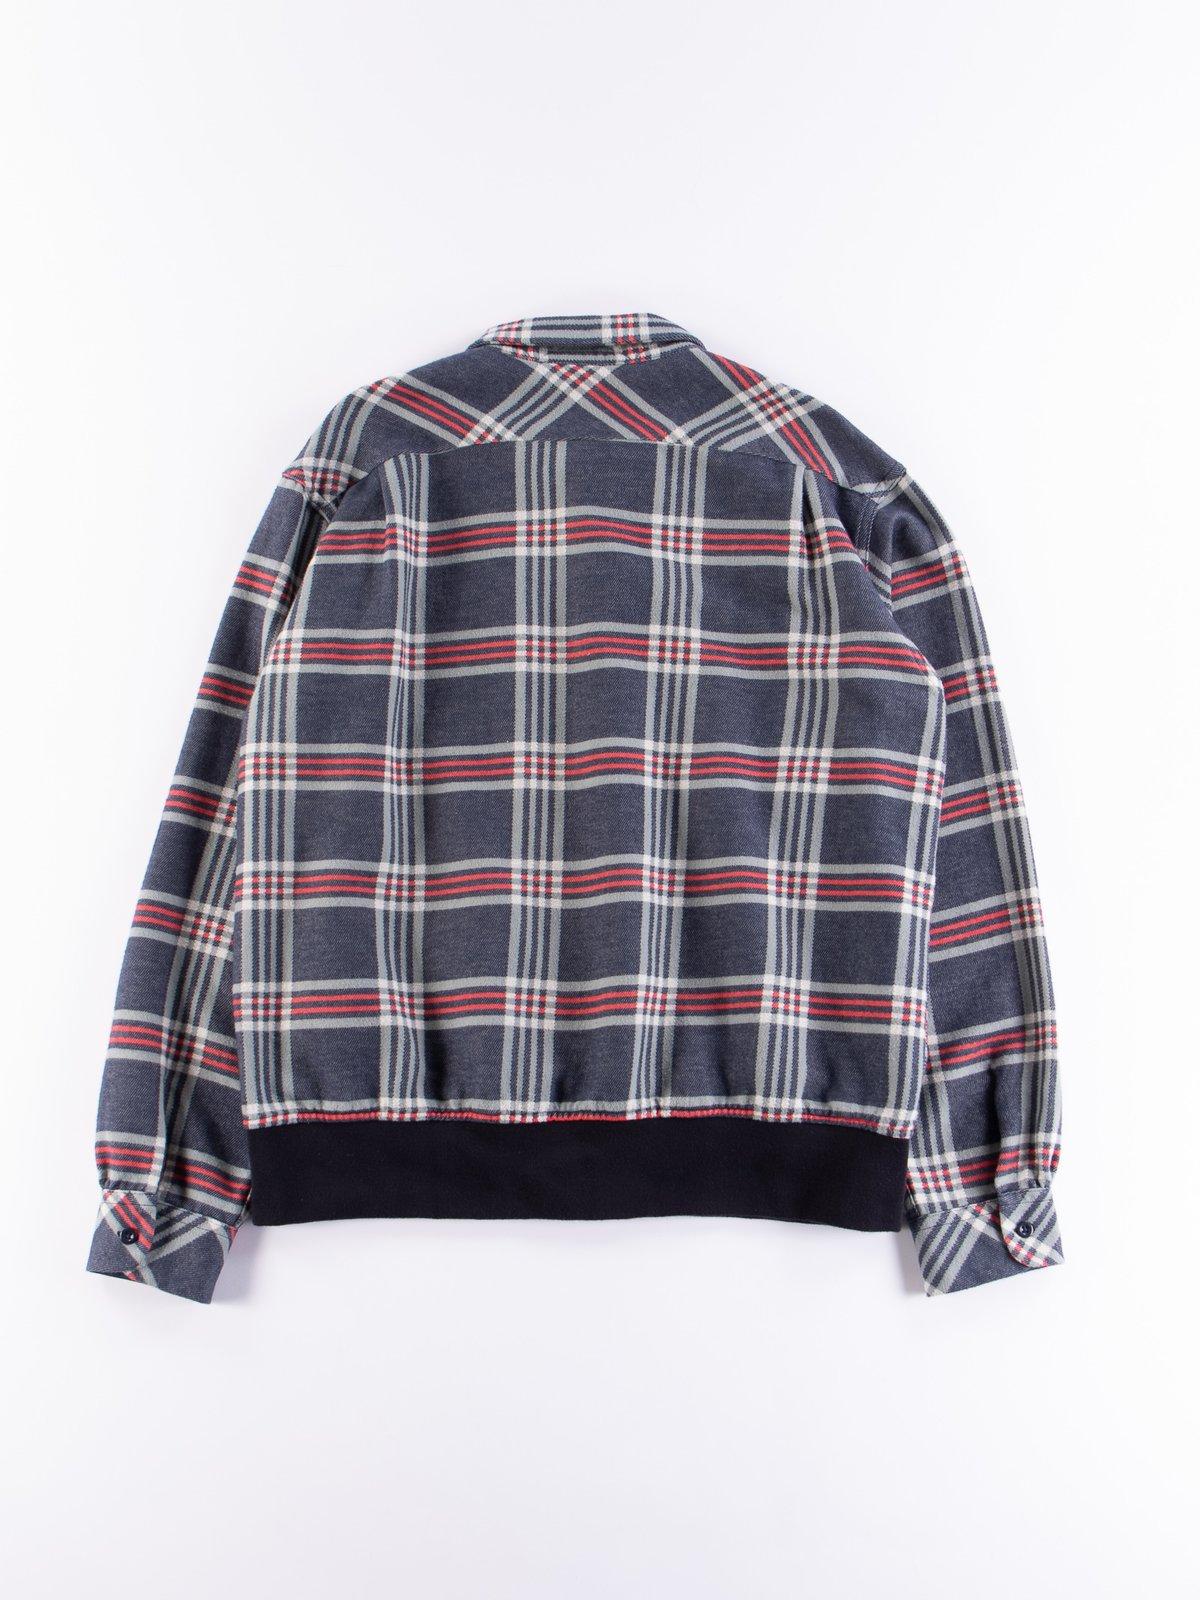 Navy/Teal/Red Big Plaid Classic Shirt - Image 7